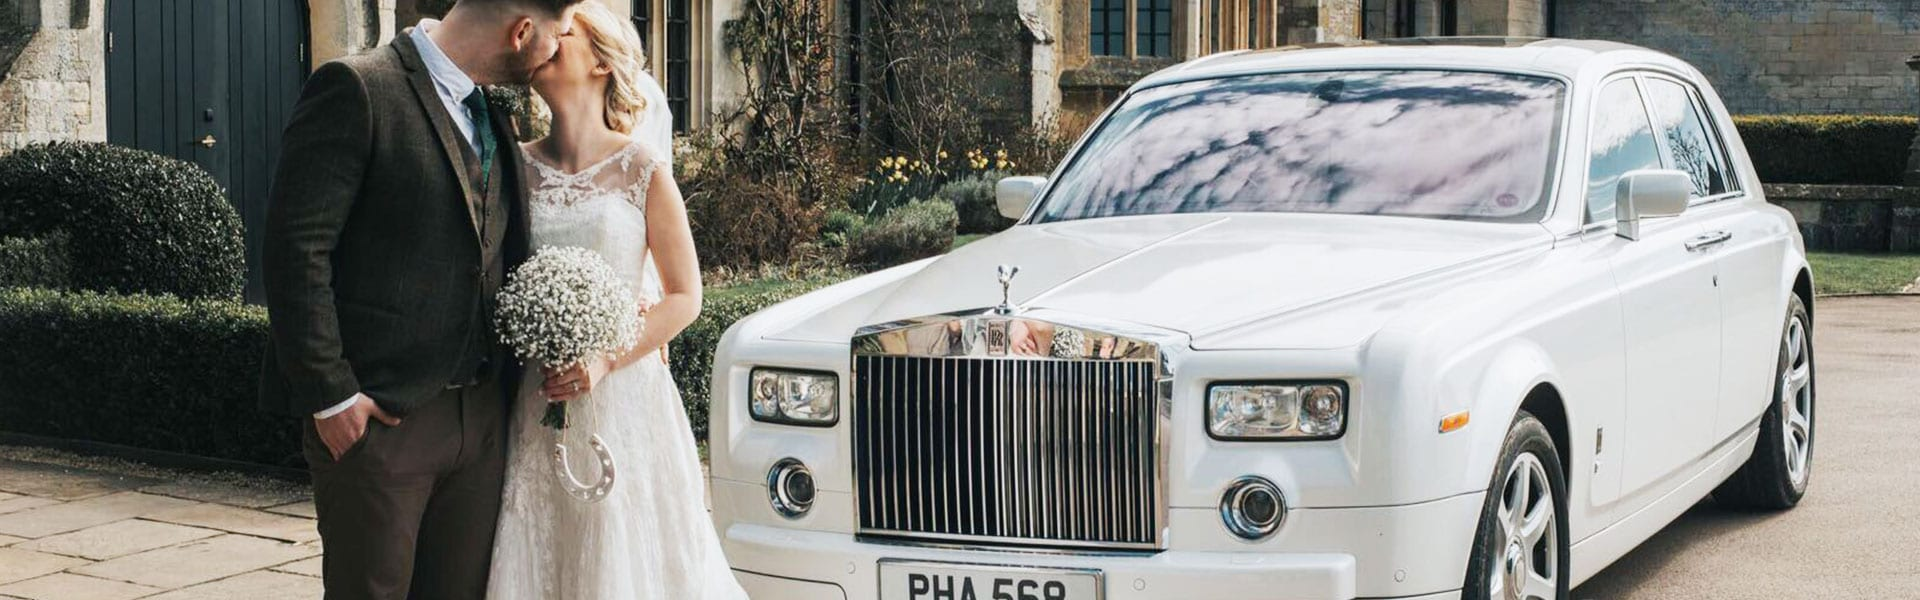 white-wedding-cars